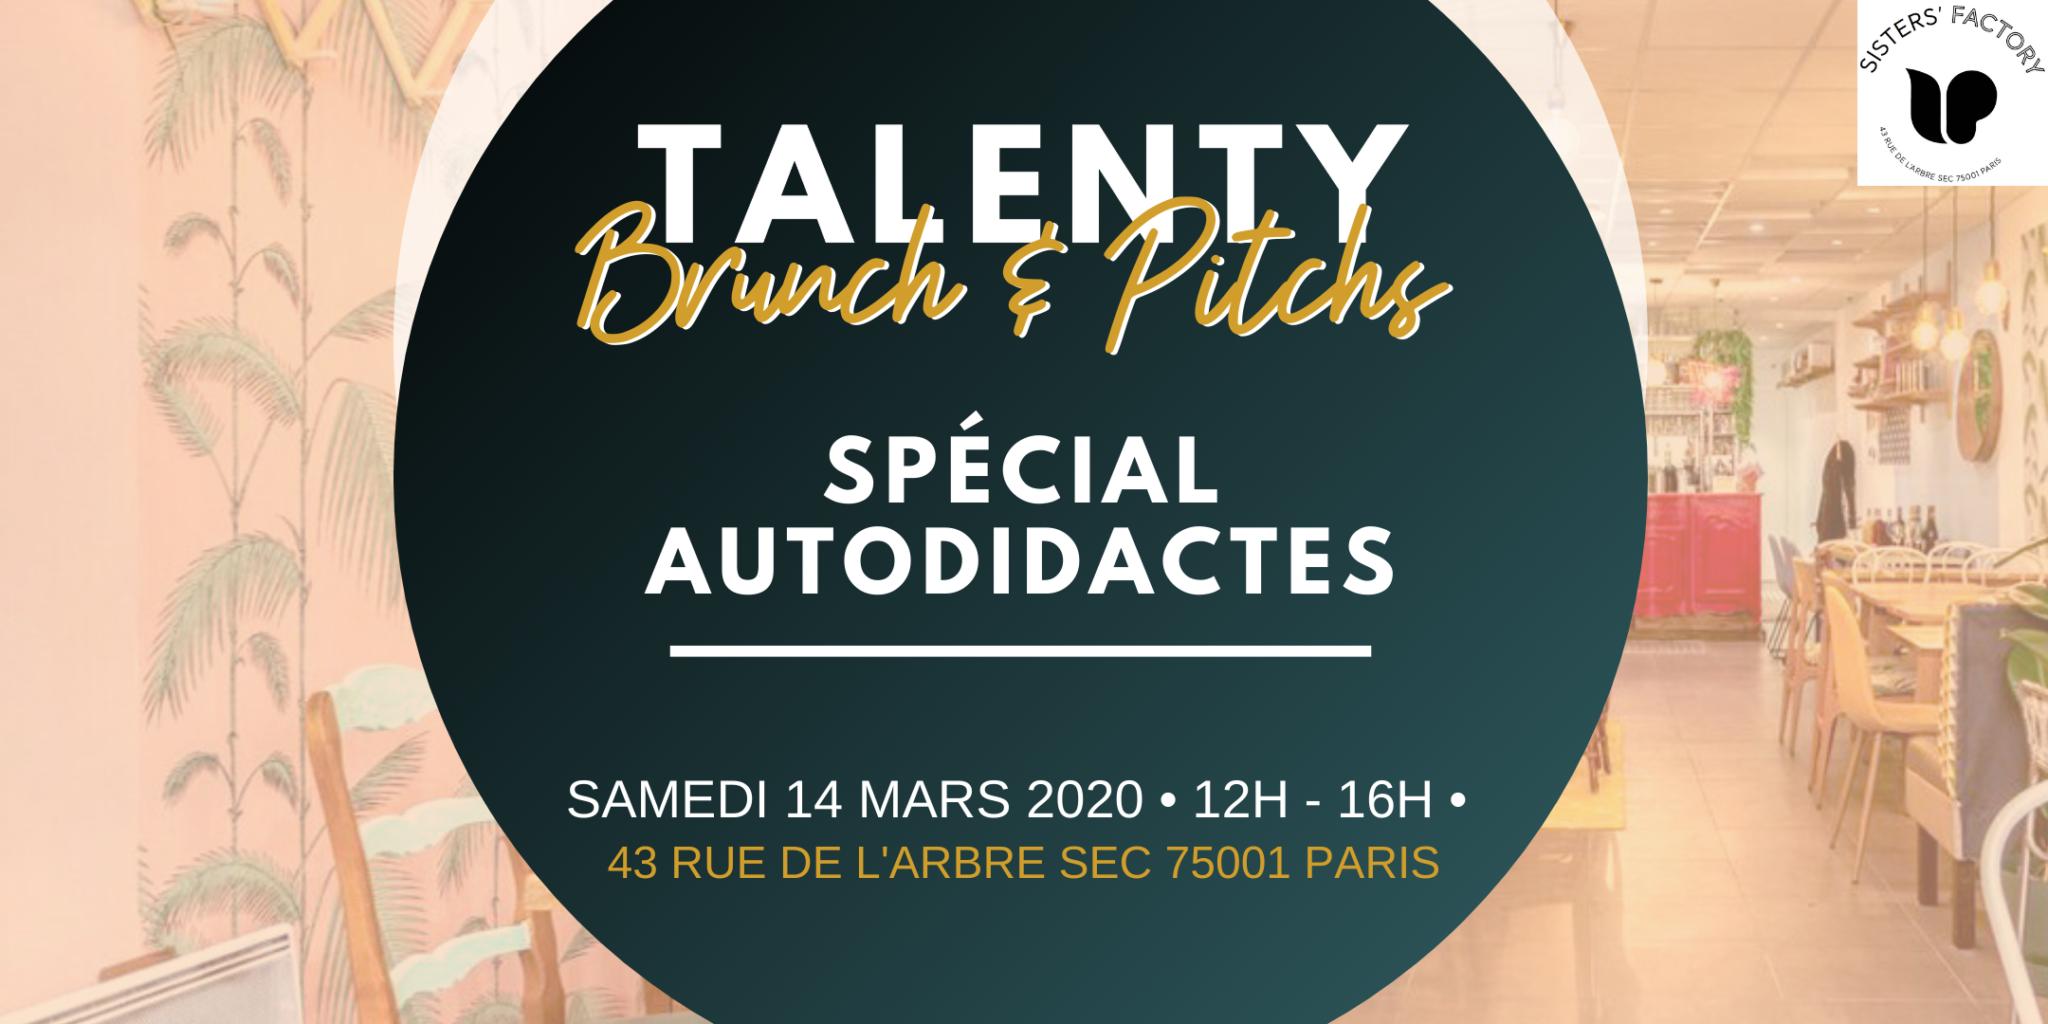 brunch & pitch